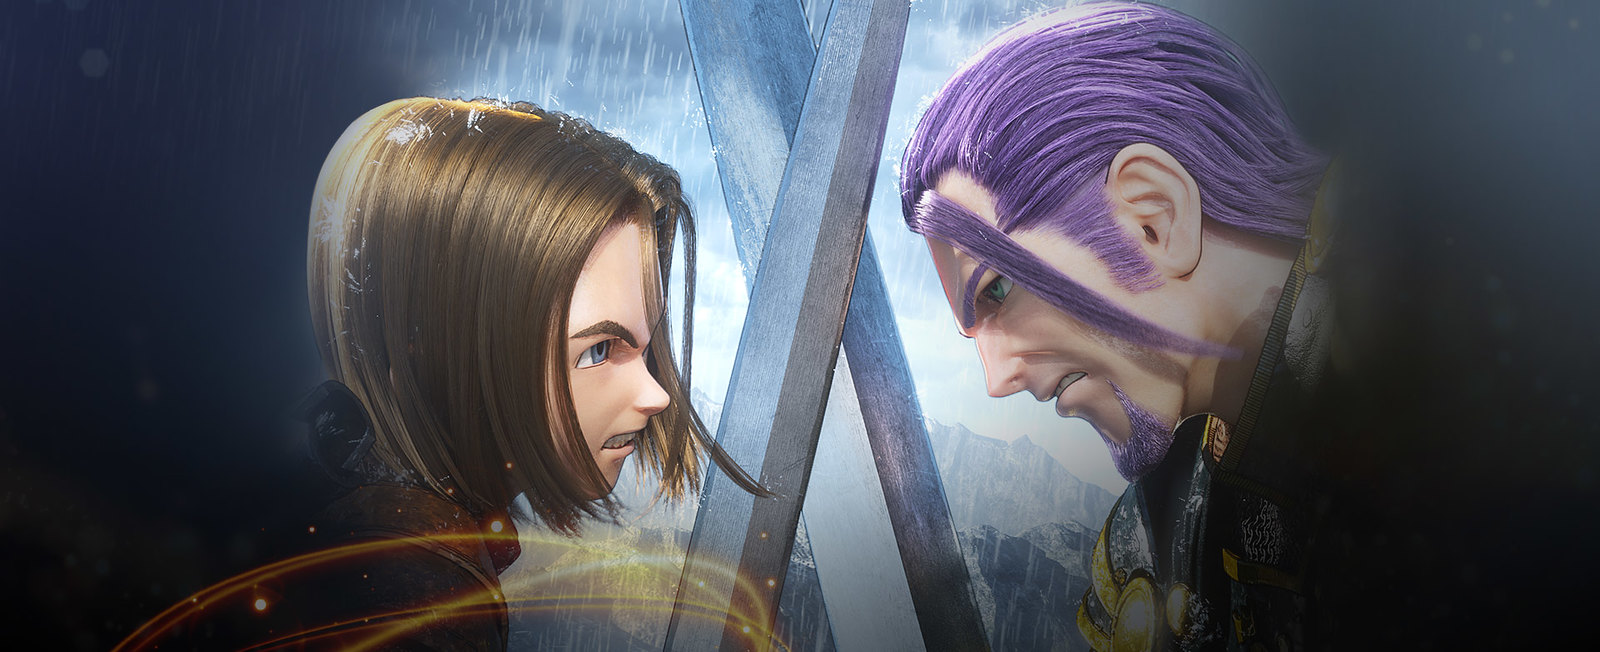 [Dragon Quest XI] เผยเนื้อเรื่องช่วงต้นและตัวละครใหม่สองคน